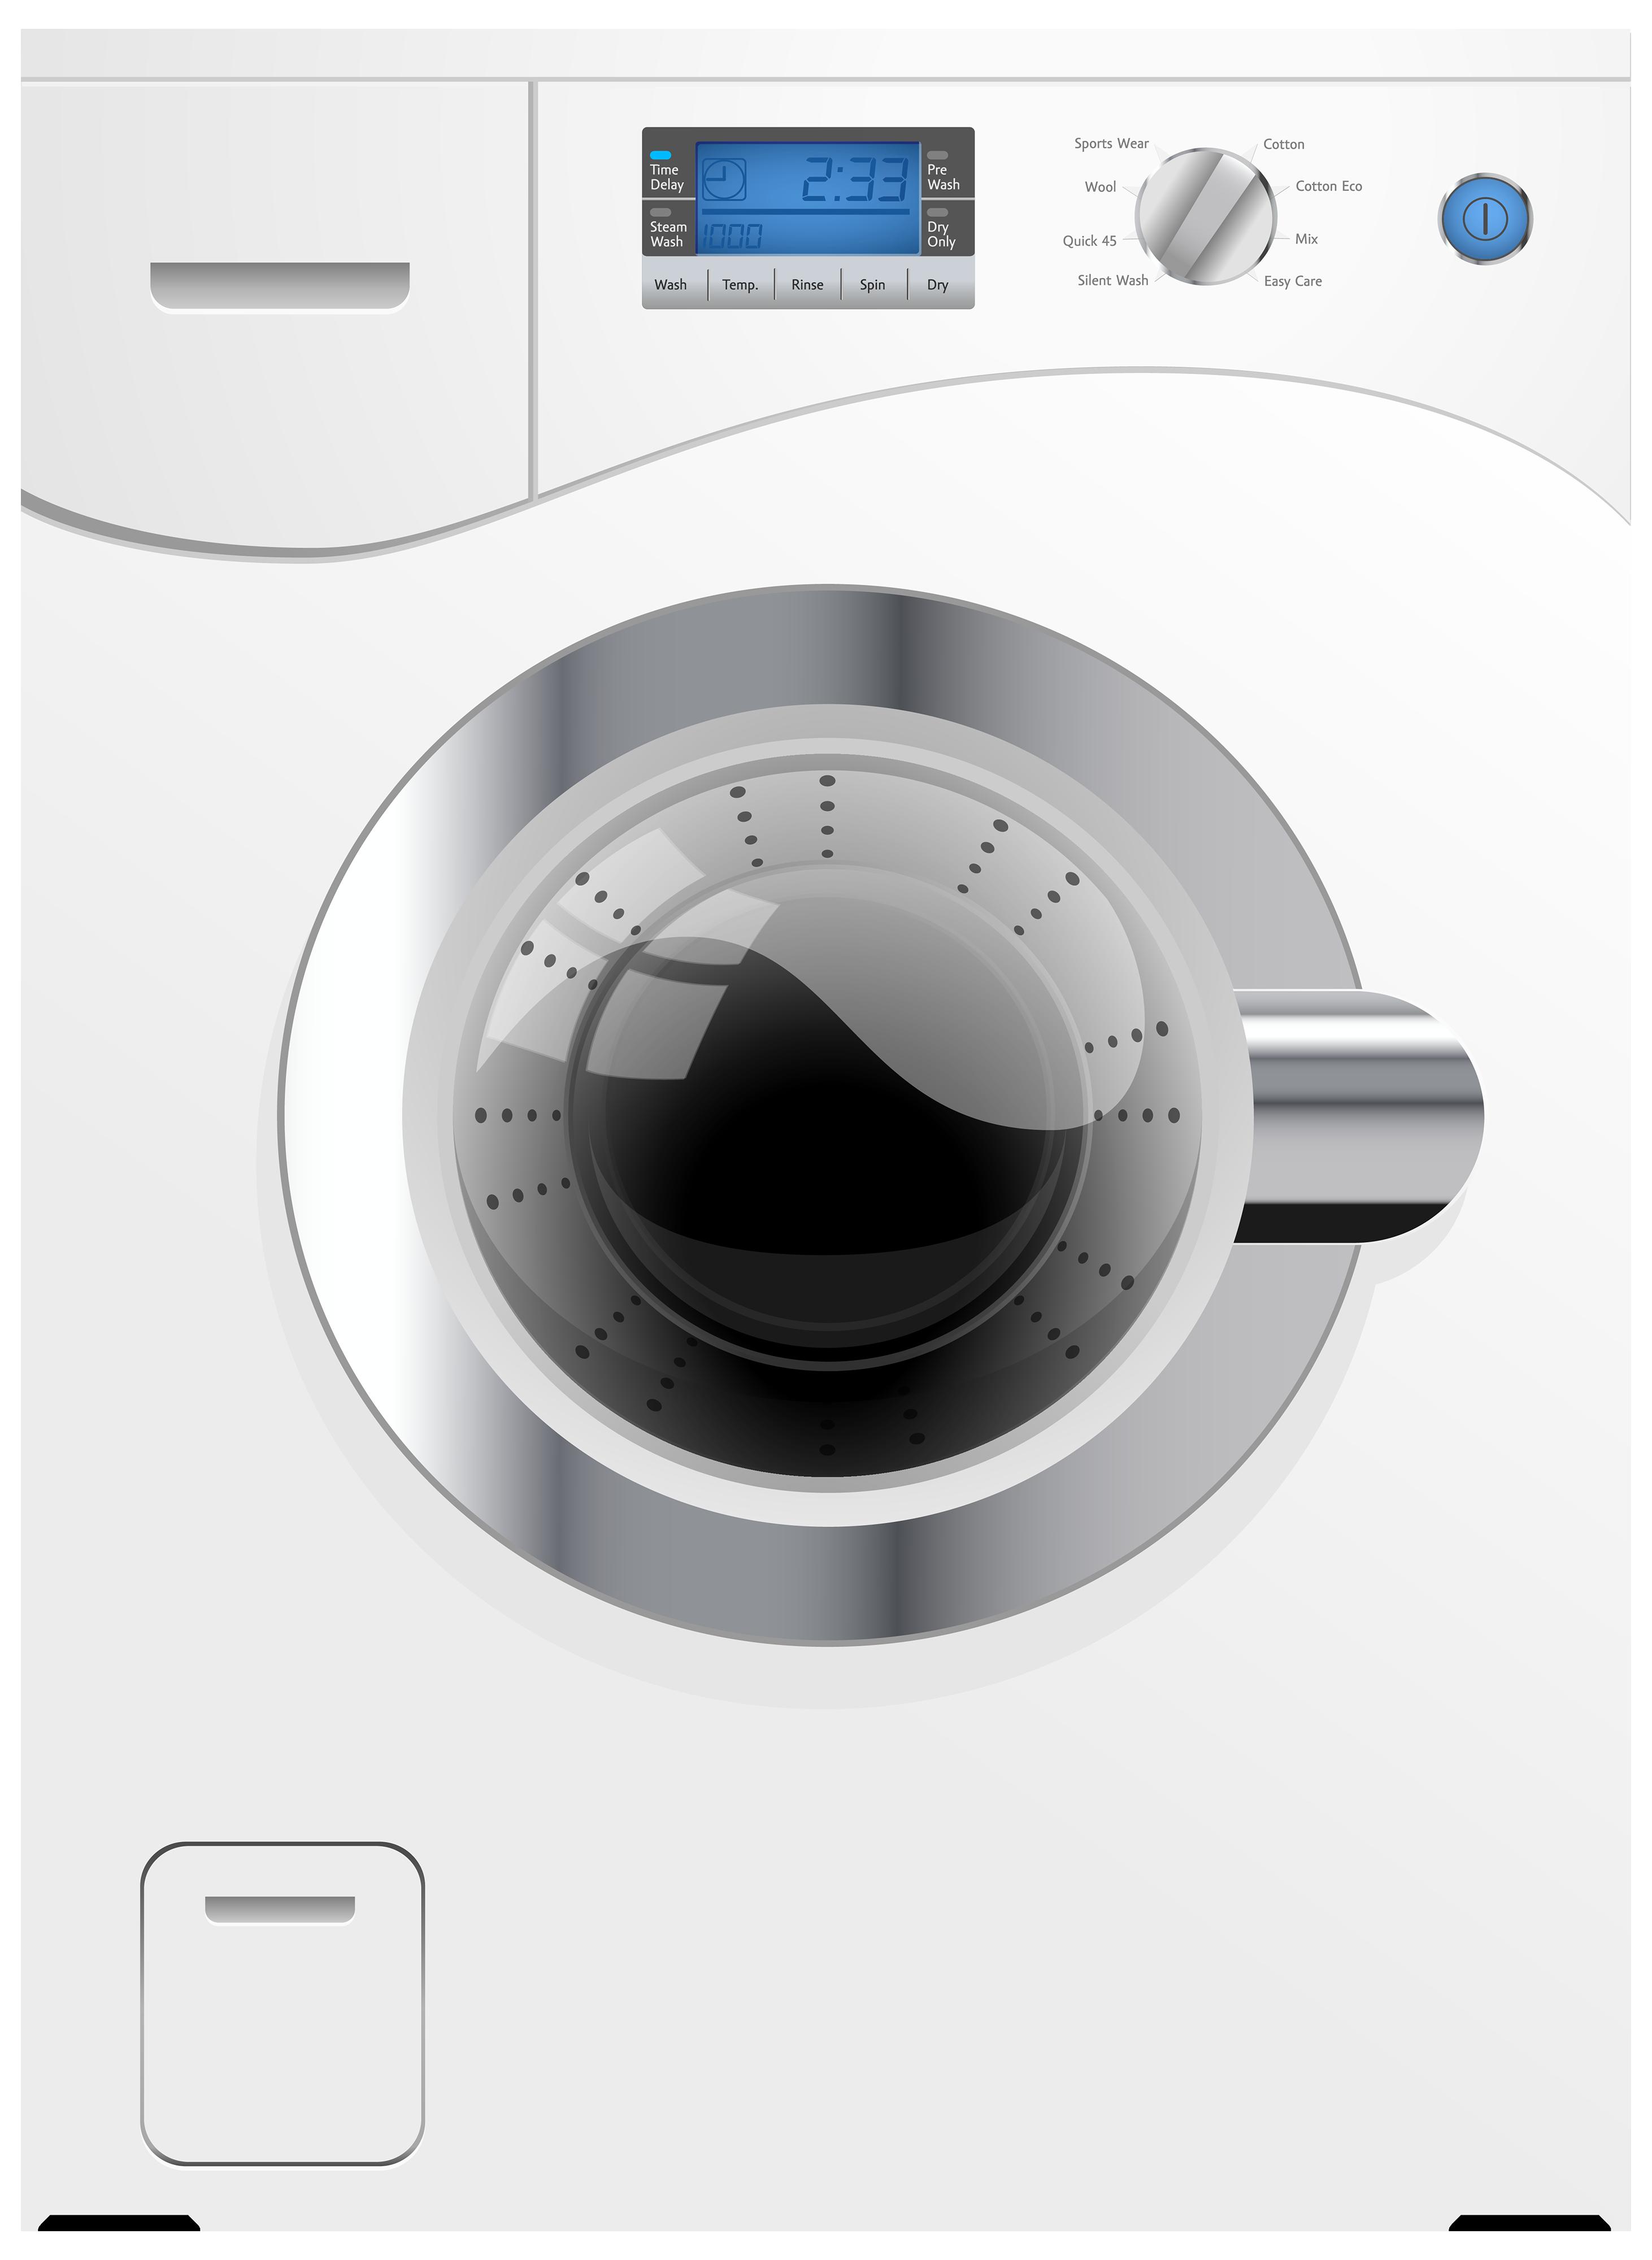 Washing machine clipart png jpg black and white White Washing Machine PNG Clipart - Best WEB Clipart jpg black and white